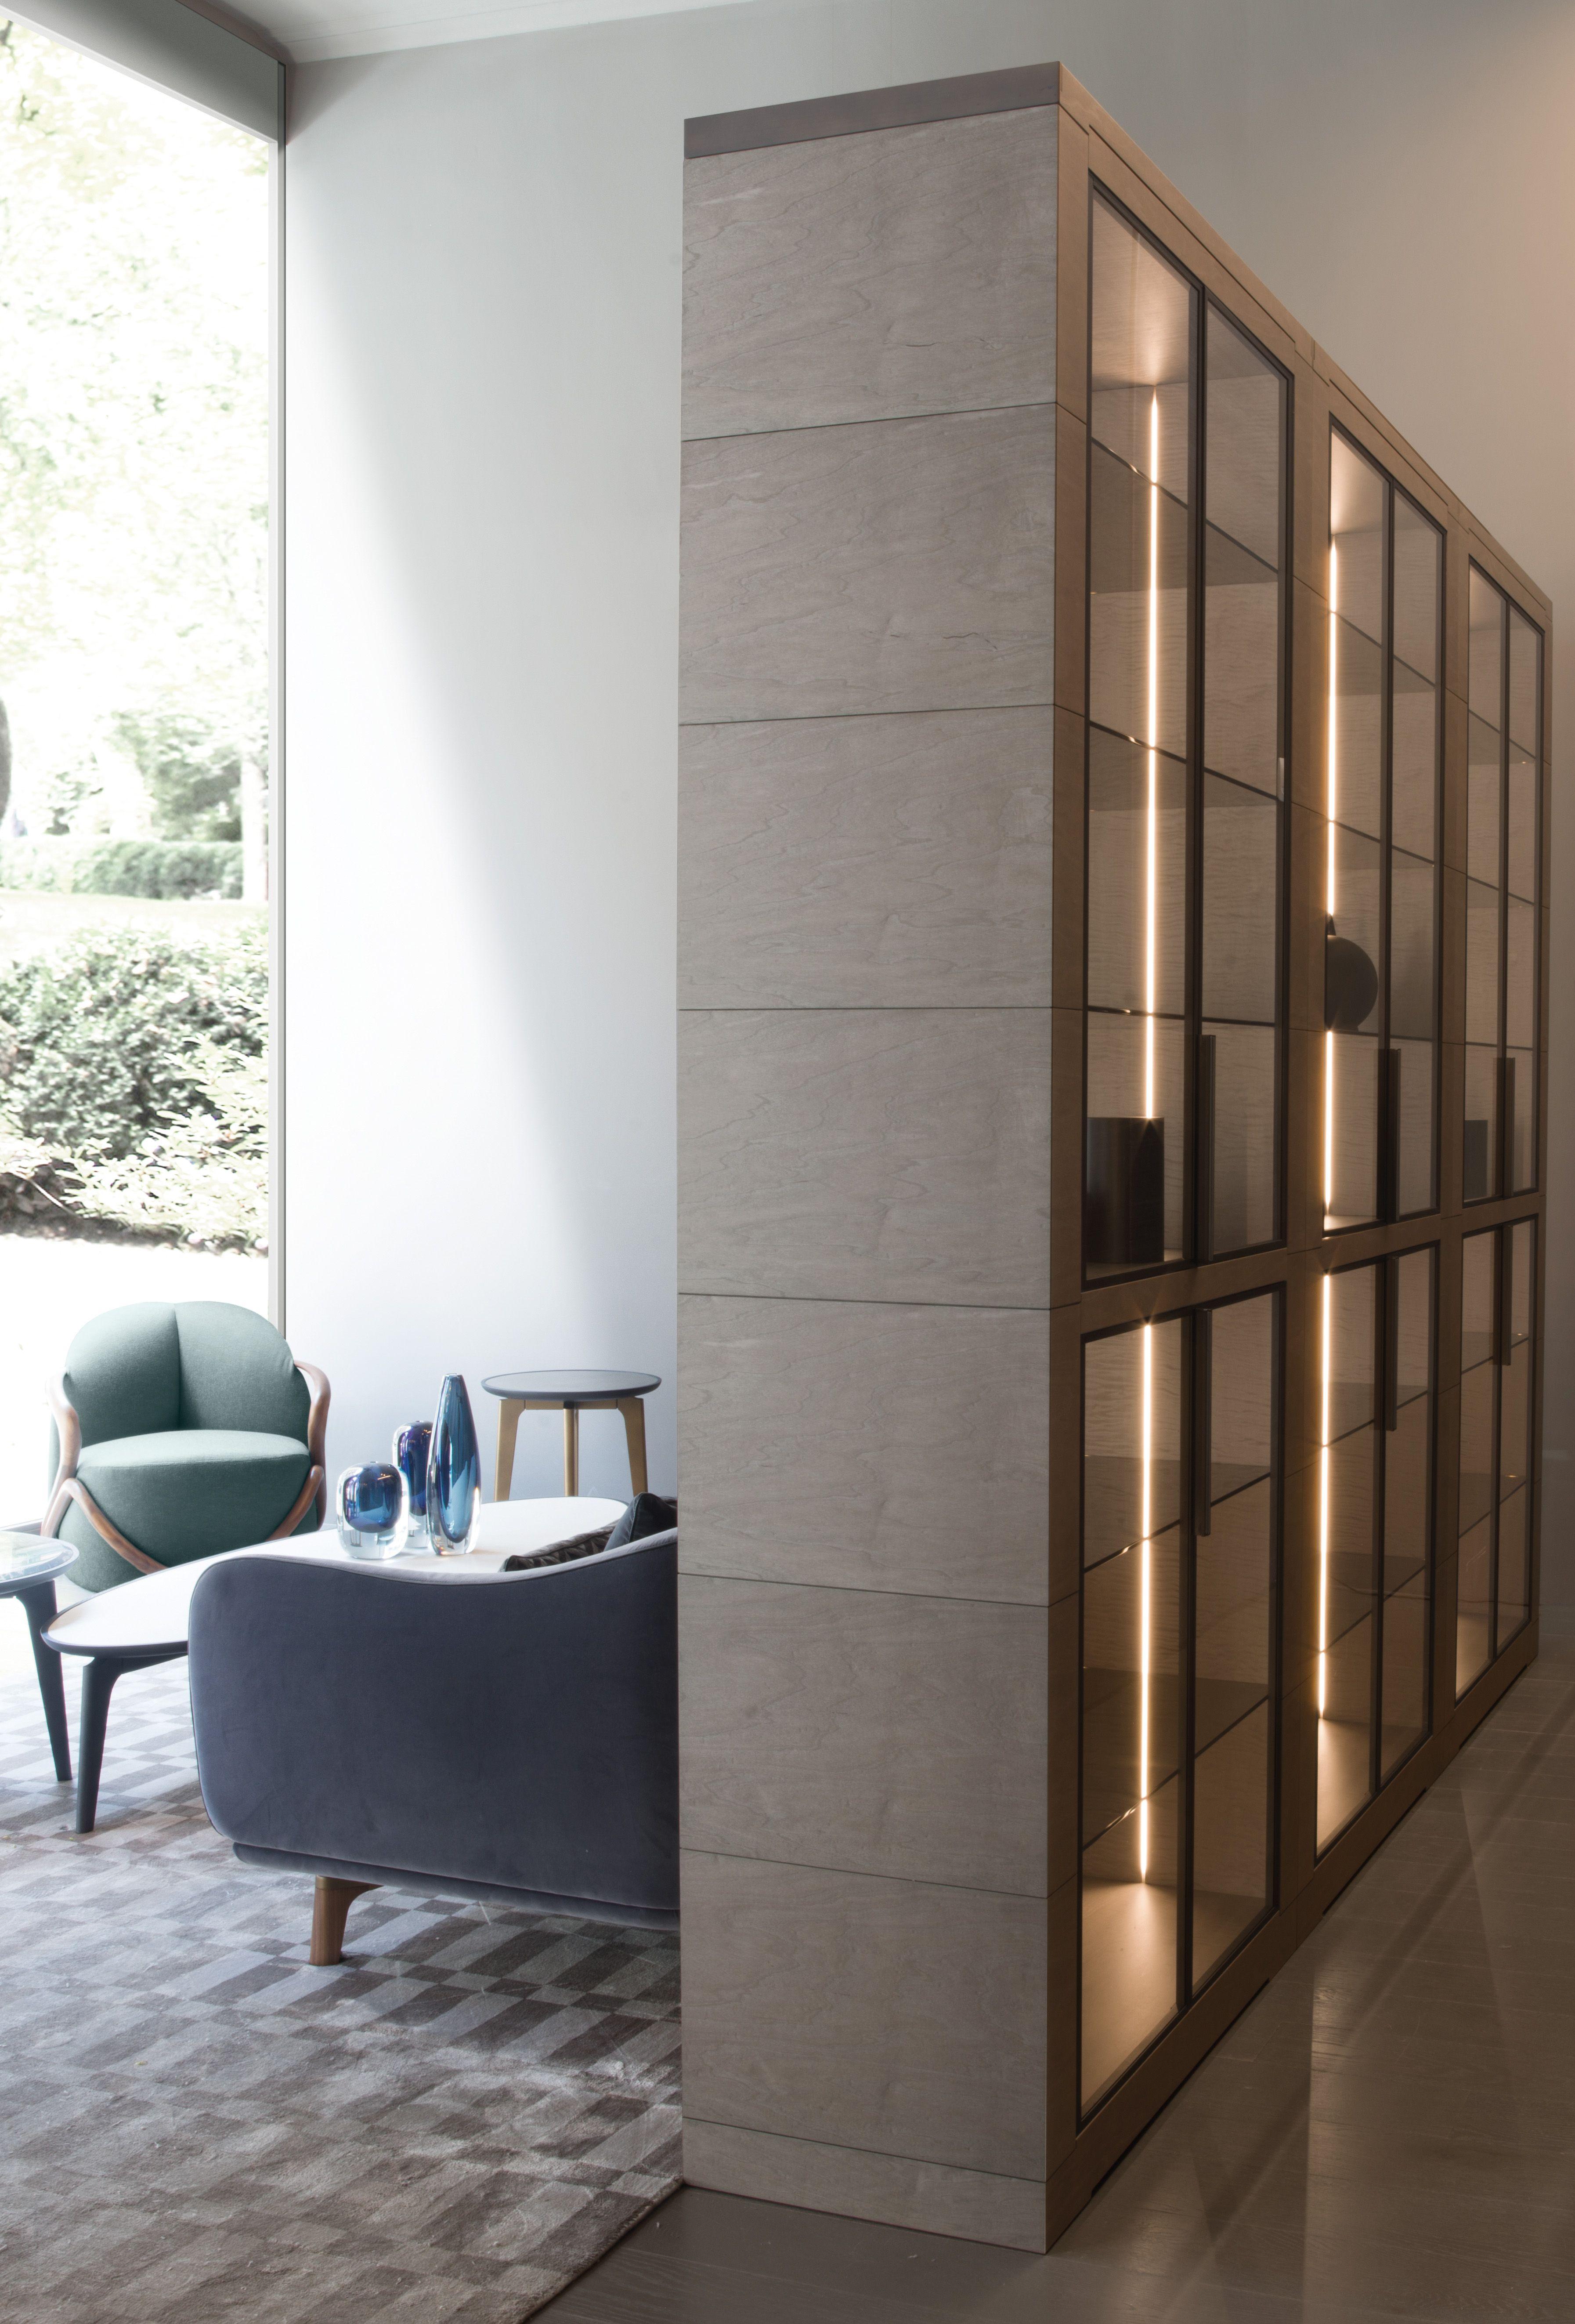 Oli is an infinitely spatial adaptive furniture modular